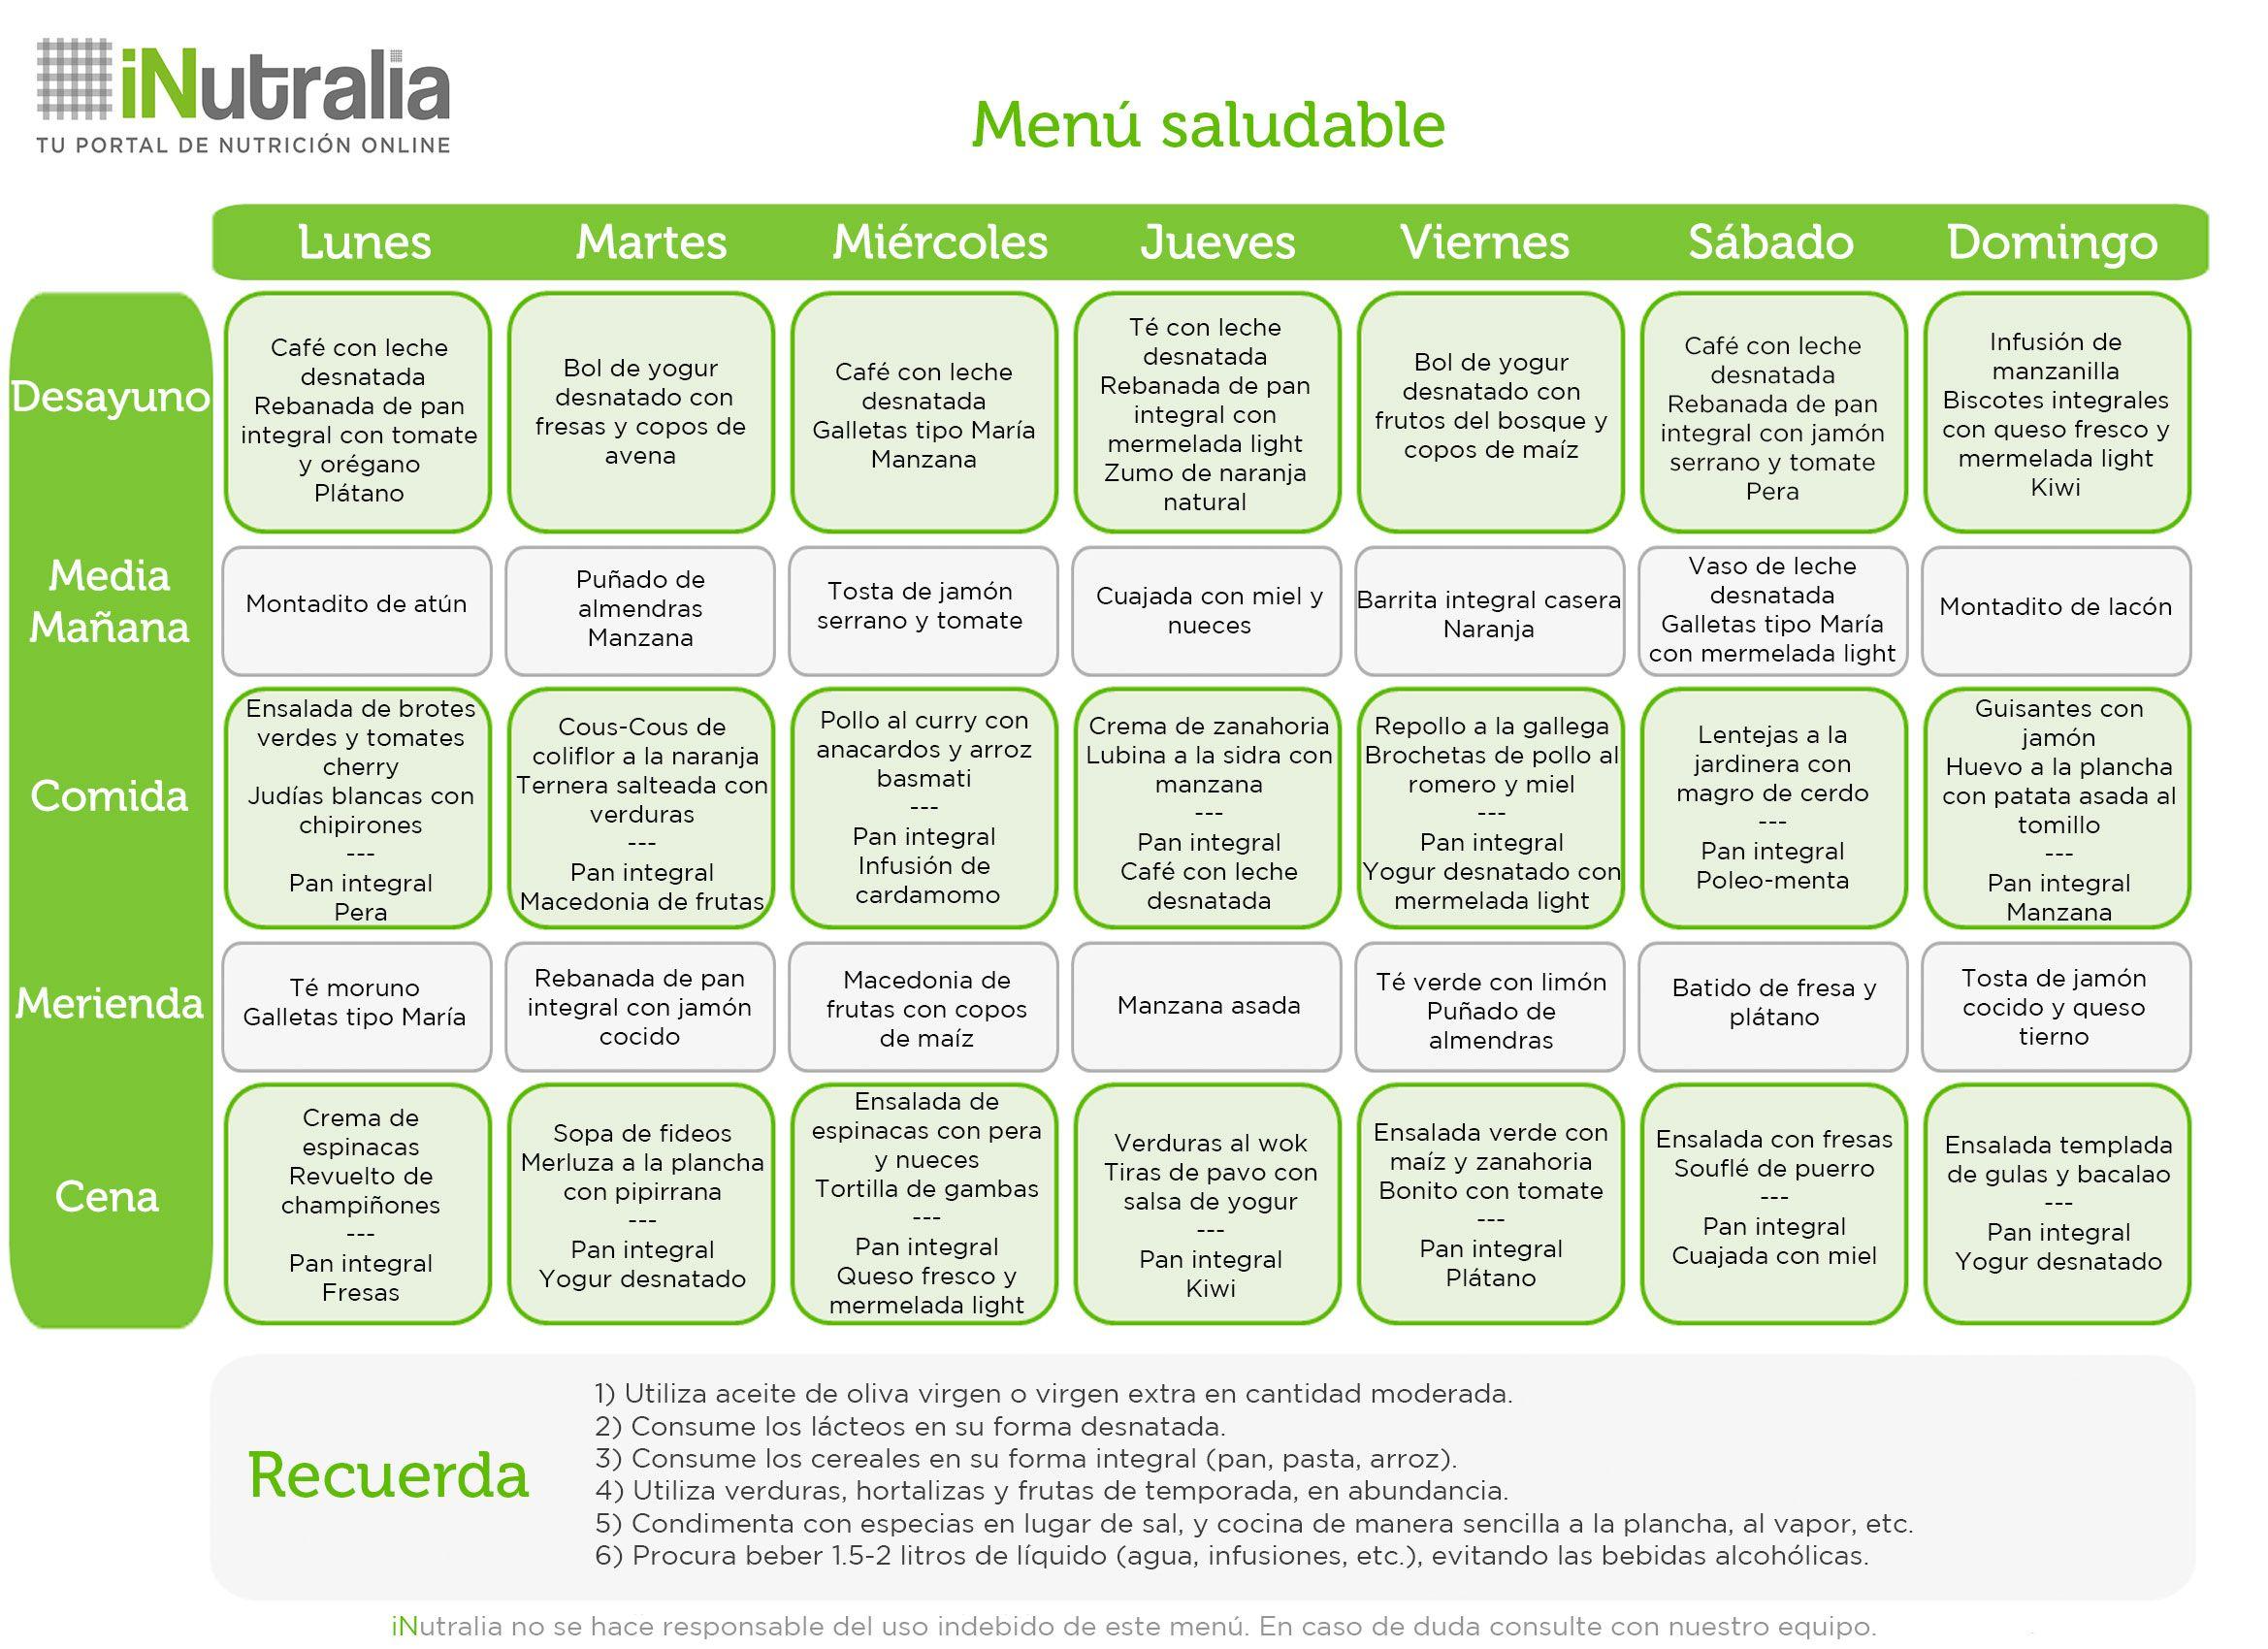 Menu semanal saludable buscar con google pinteres for Menu para comida familiar